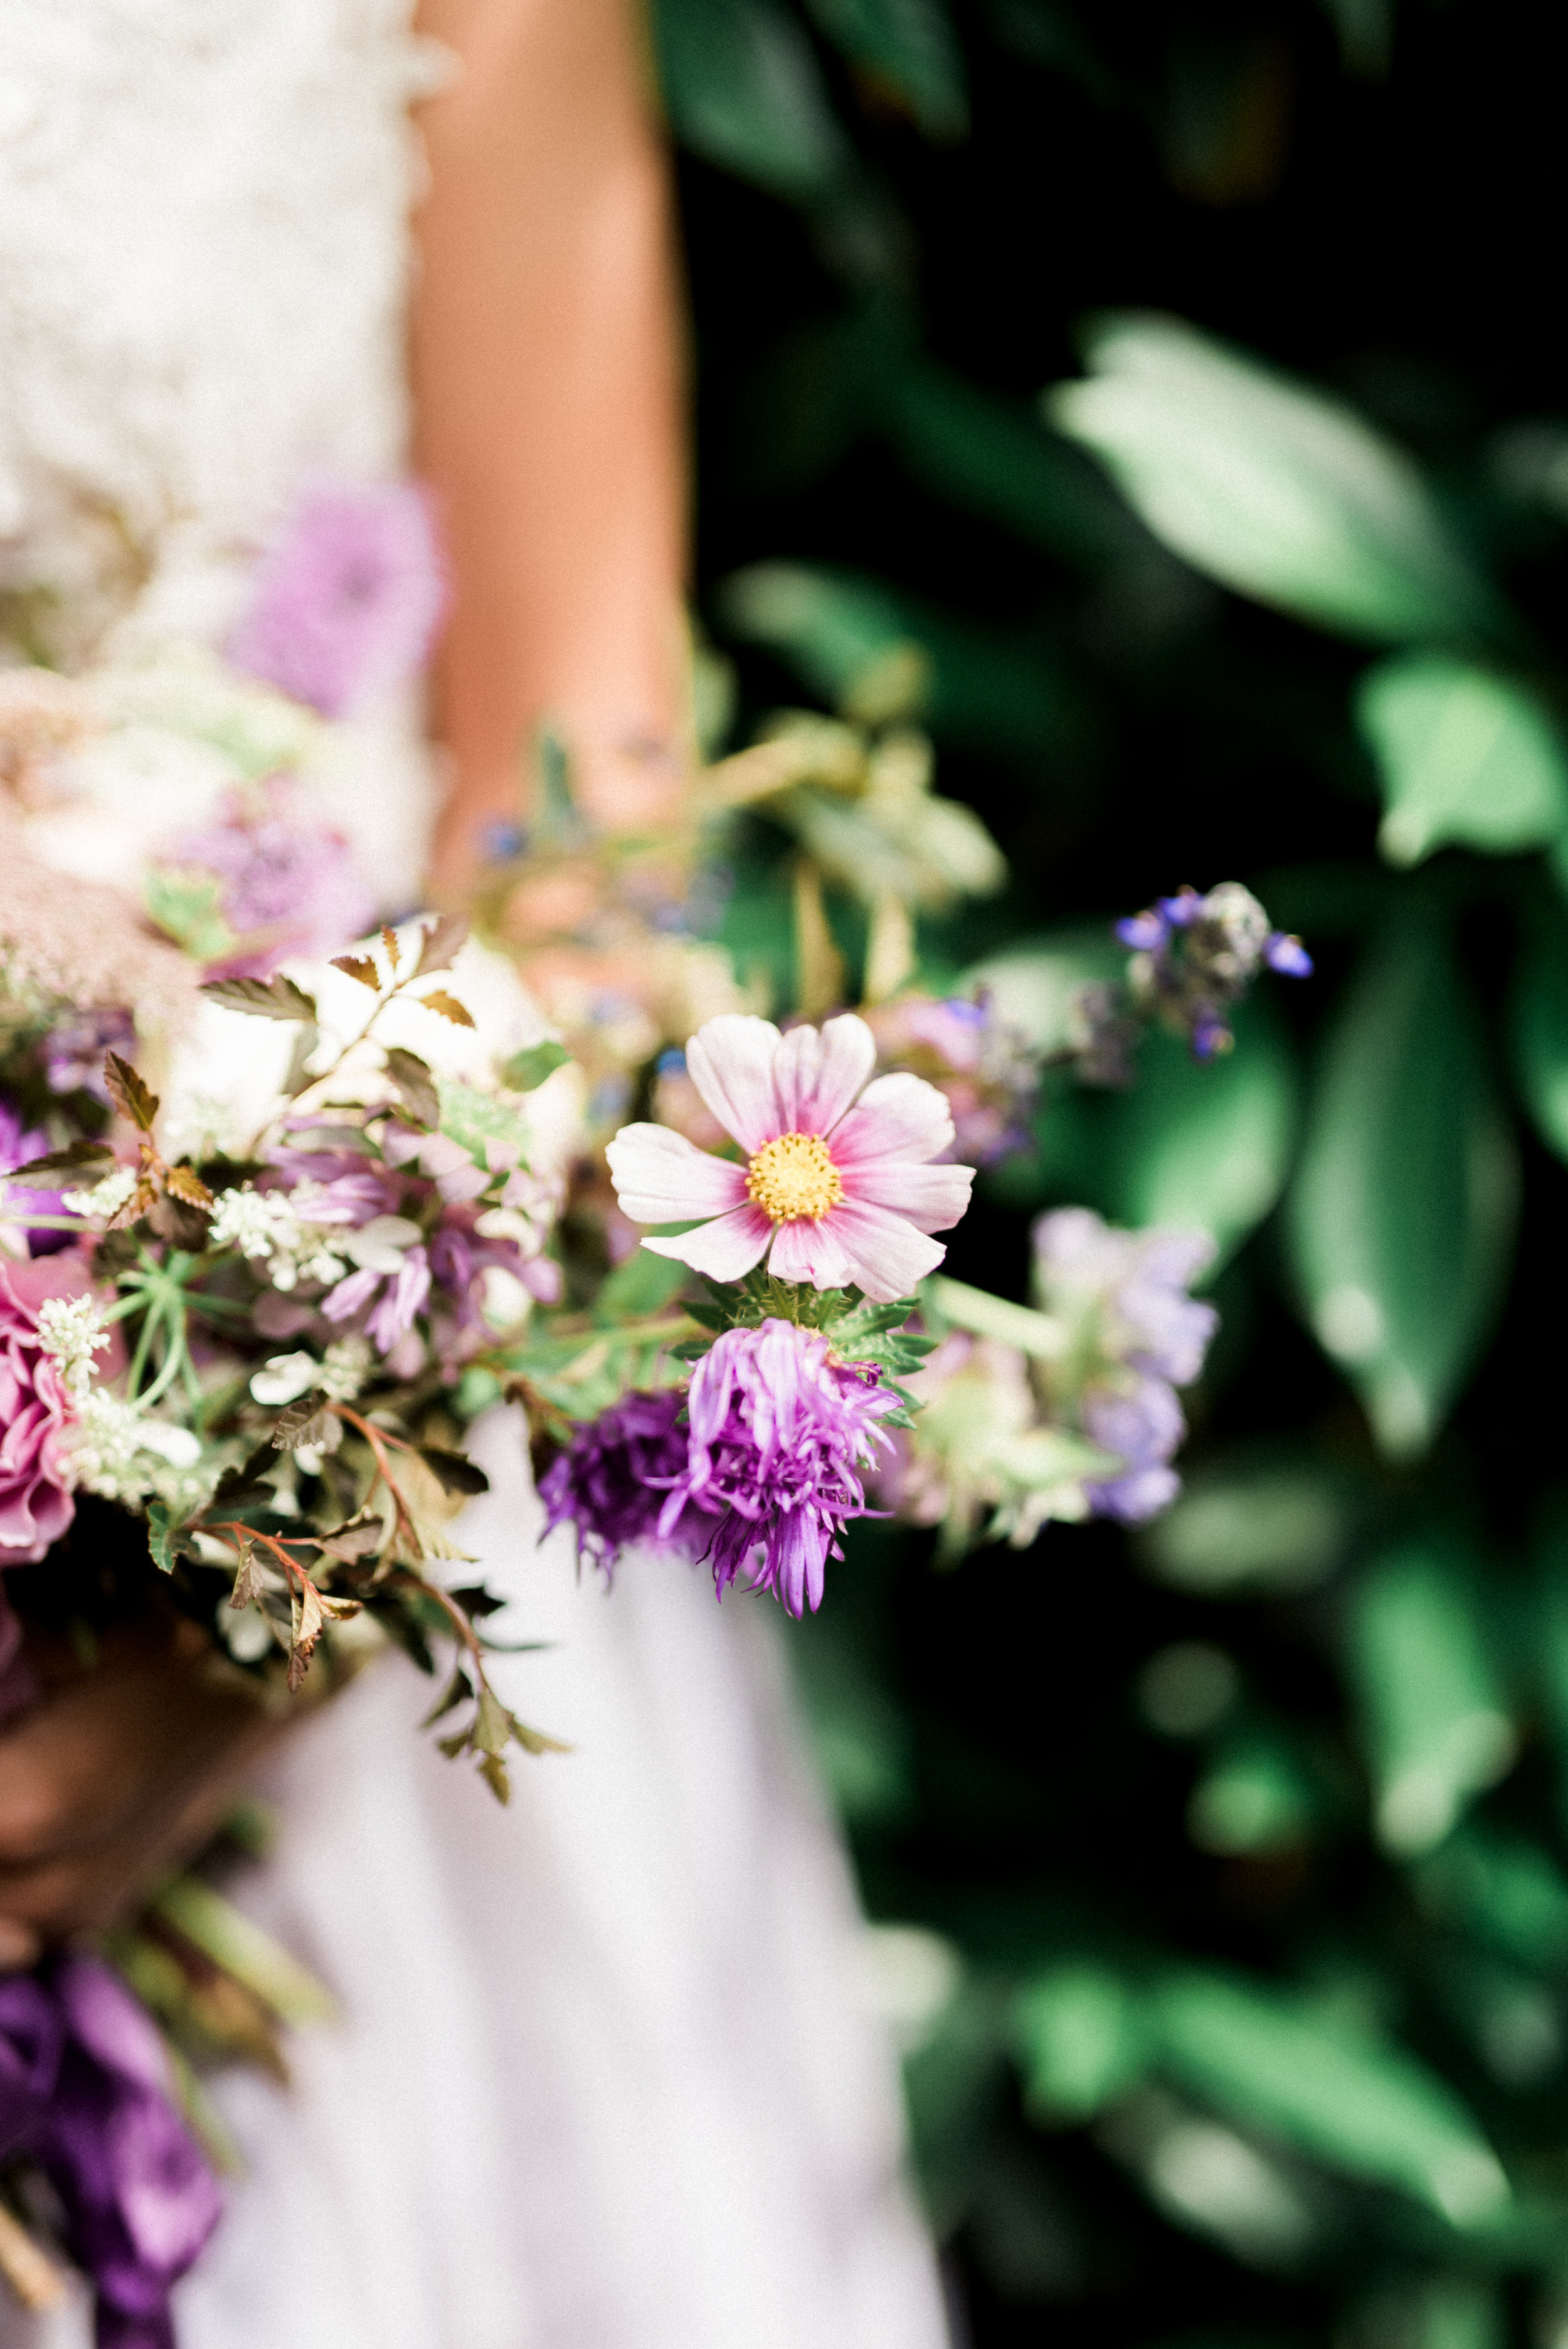 haley-richter-photography-pomme-lavender-wedding-inspiration-036.jpg